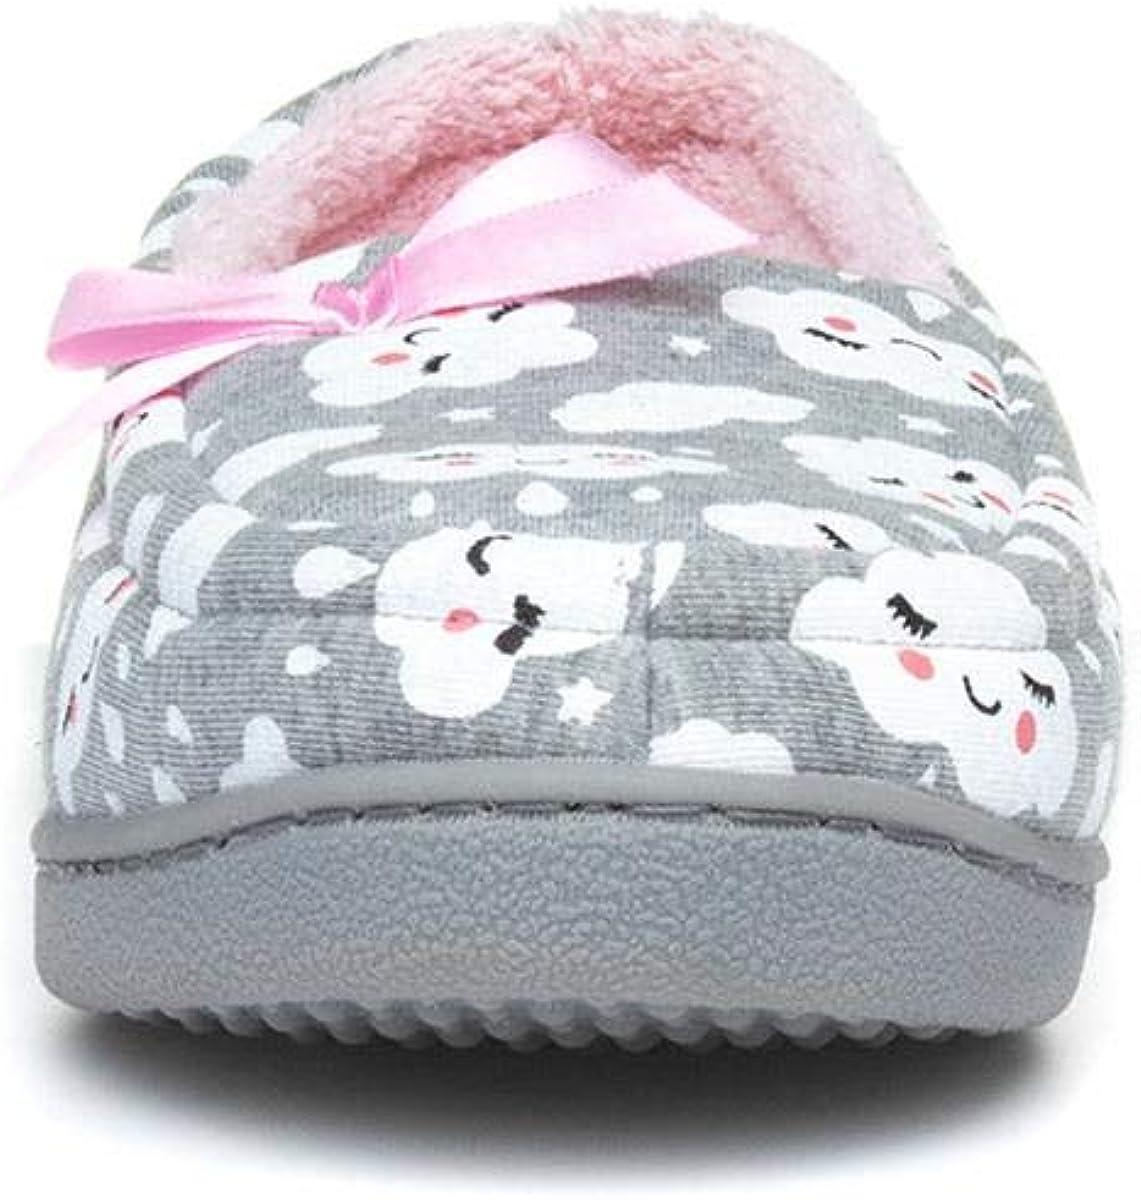 The Slipper Company Womens Moccasin Grey Slipper